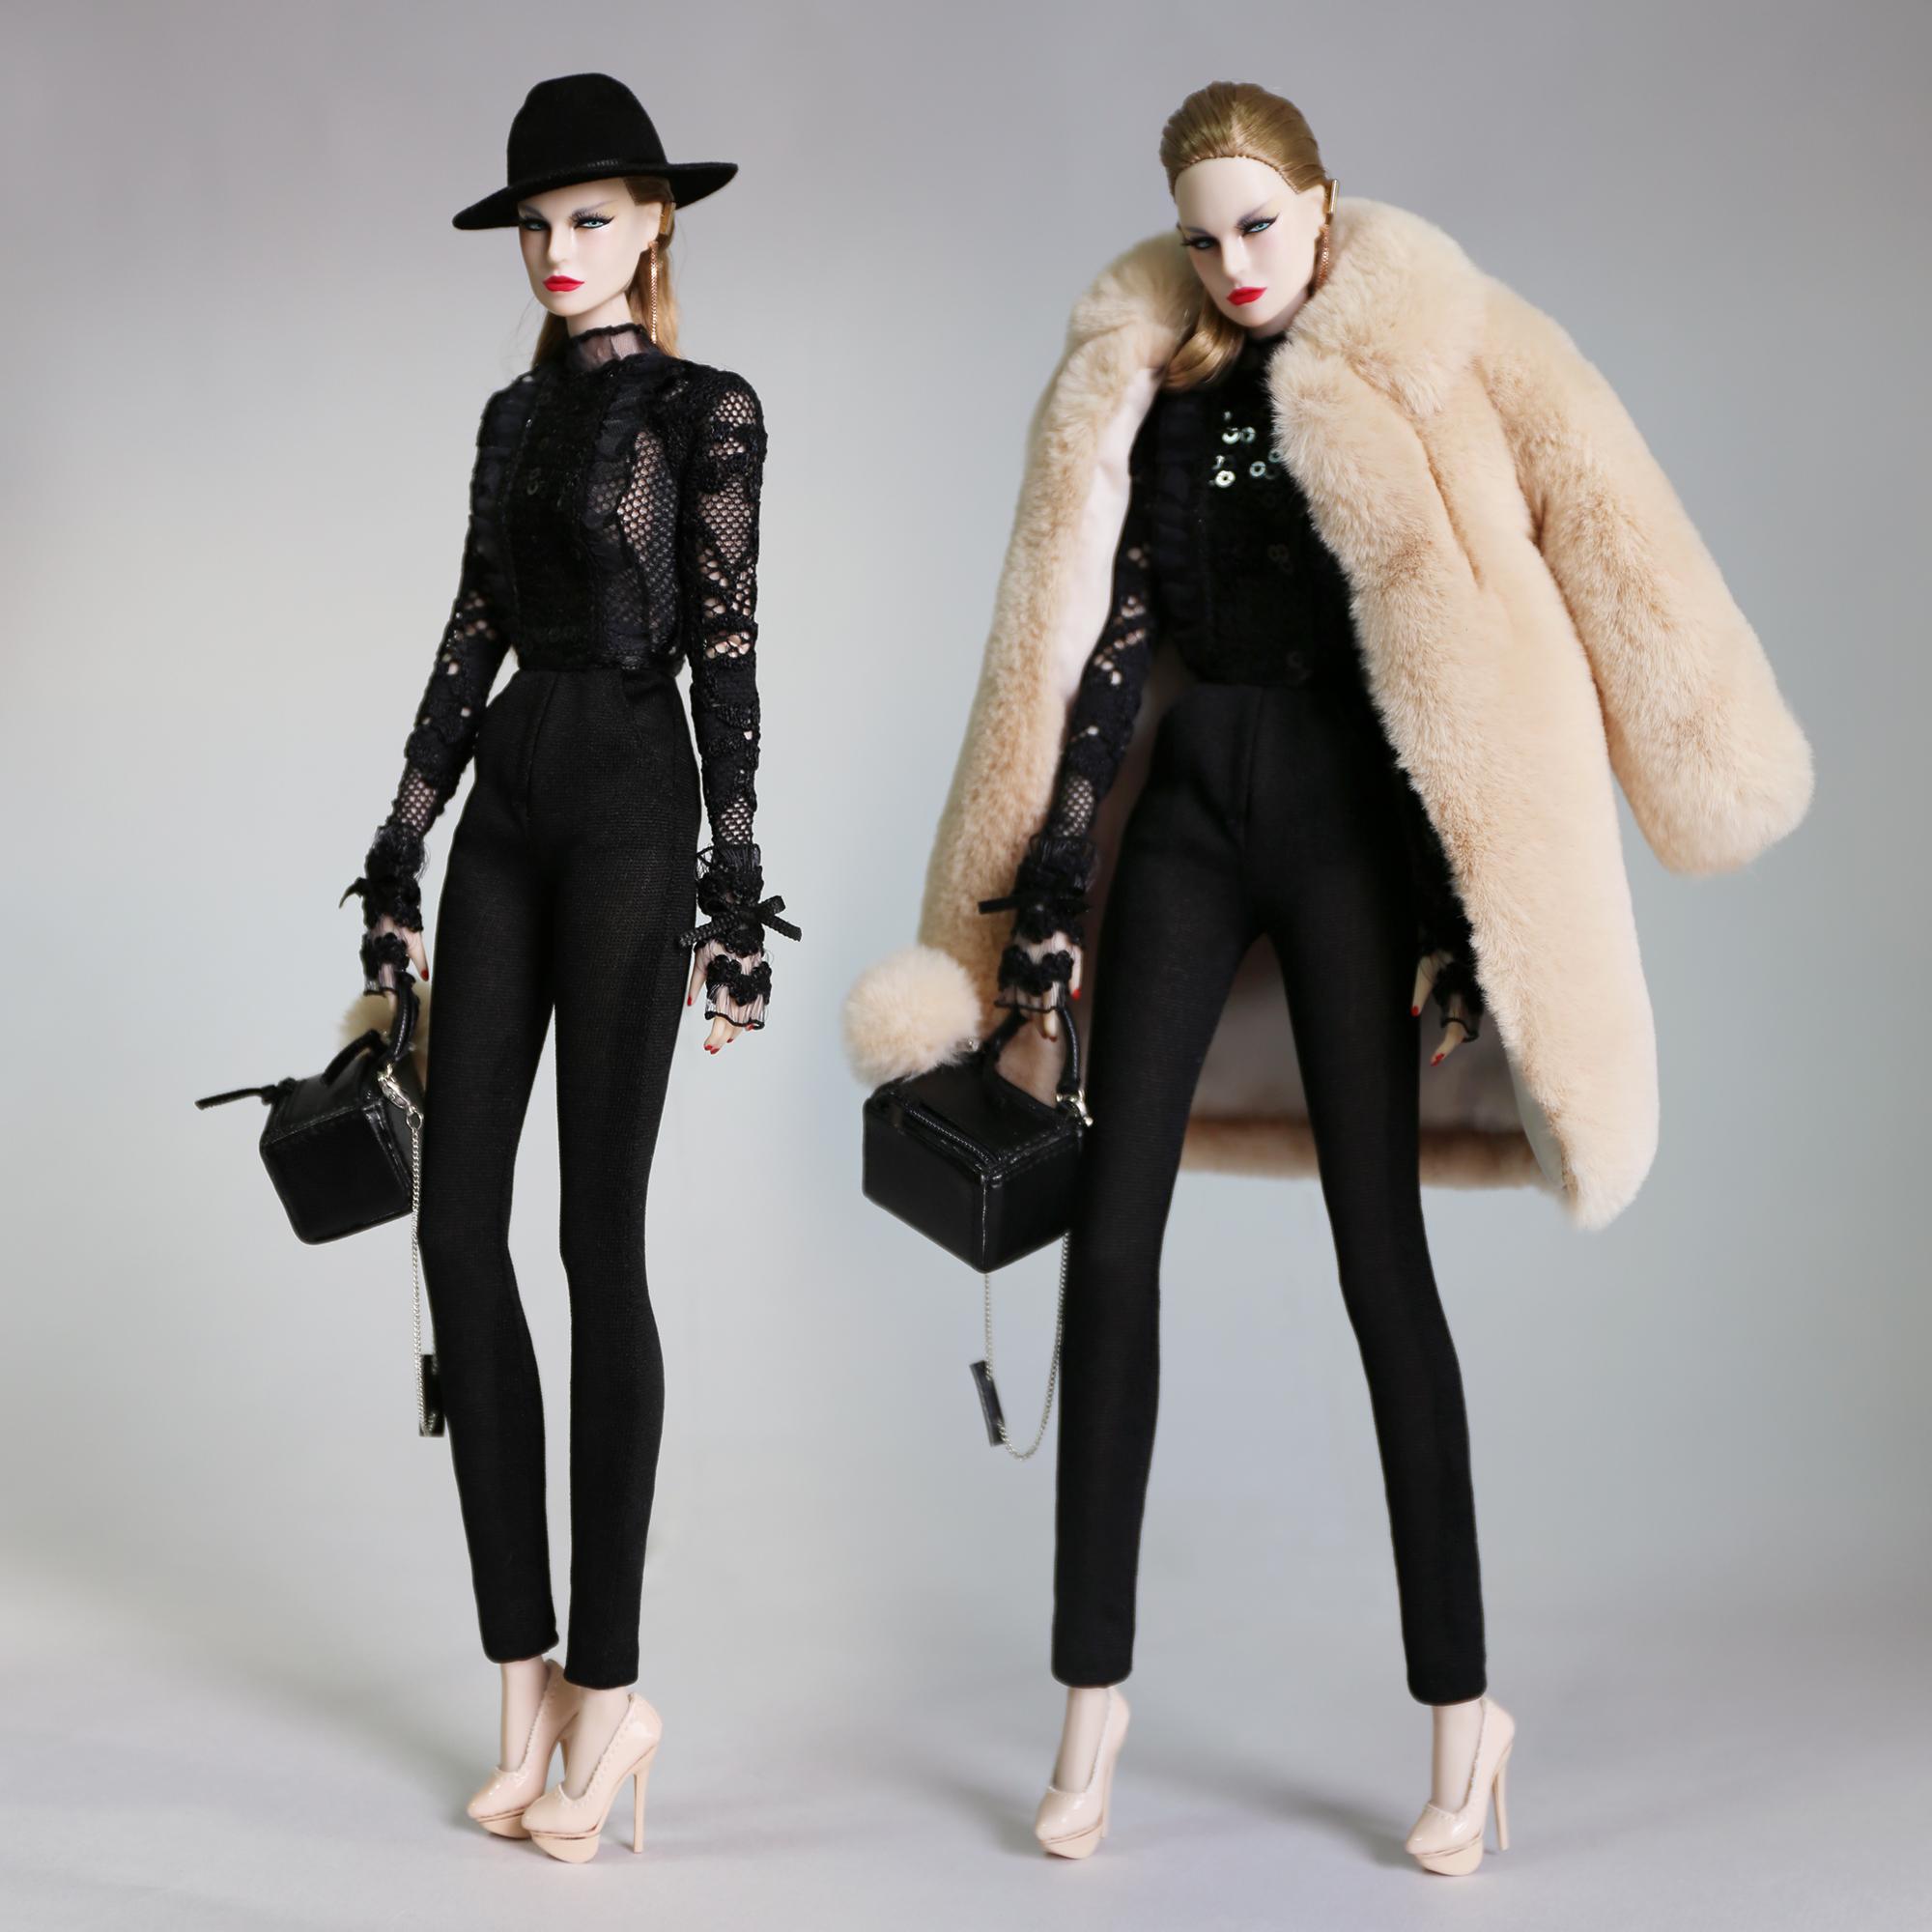 Lovetones Aw2016 Collection Dutch Fashion Doll World